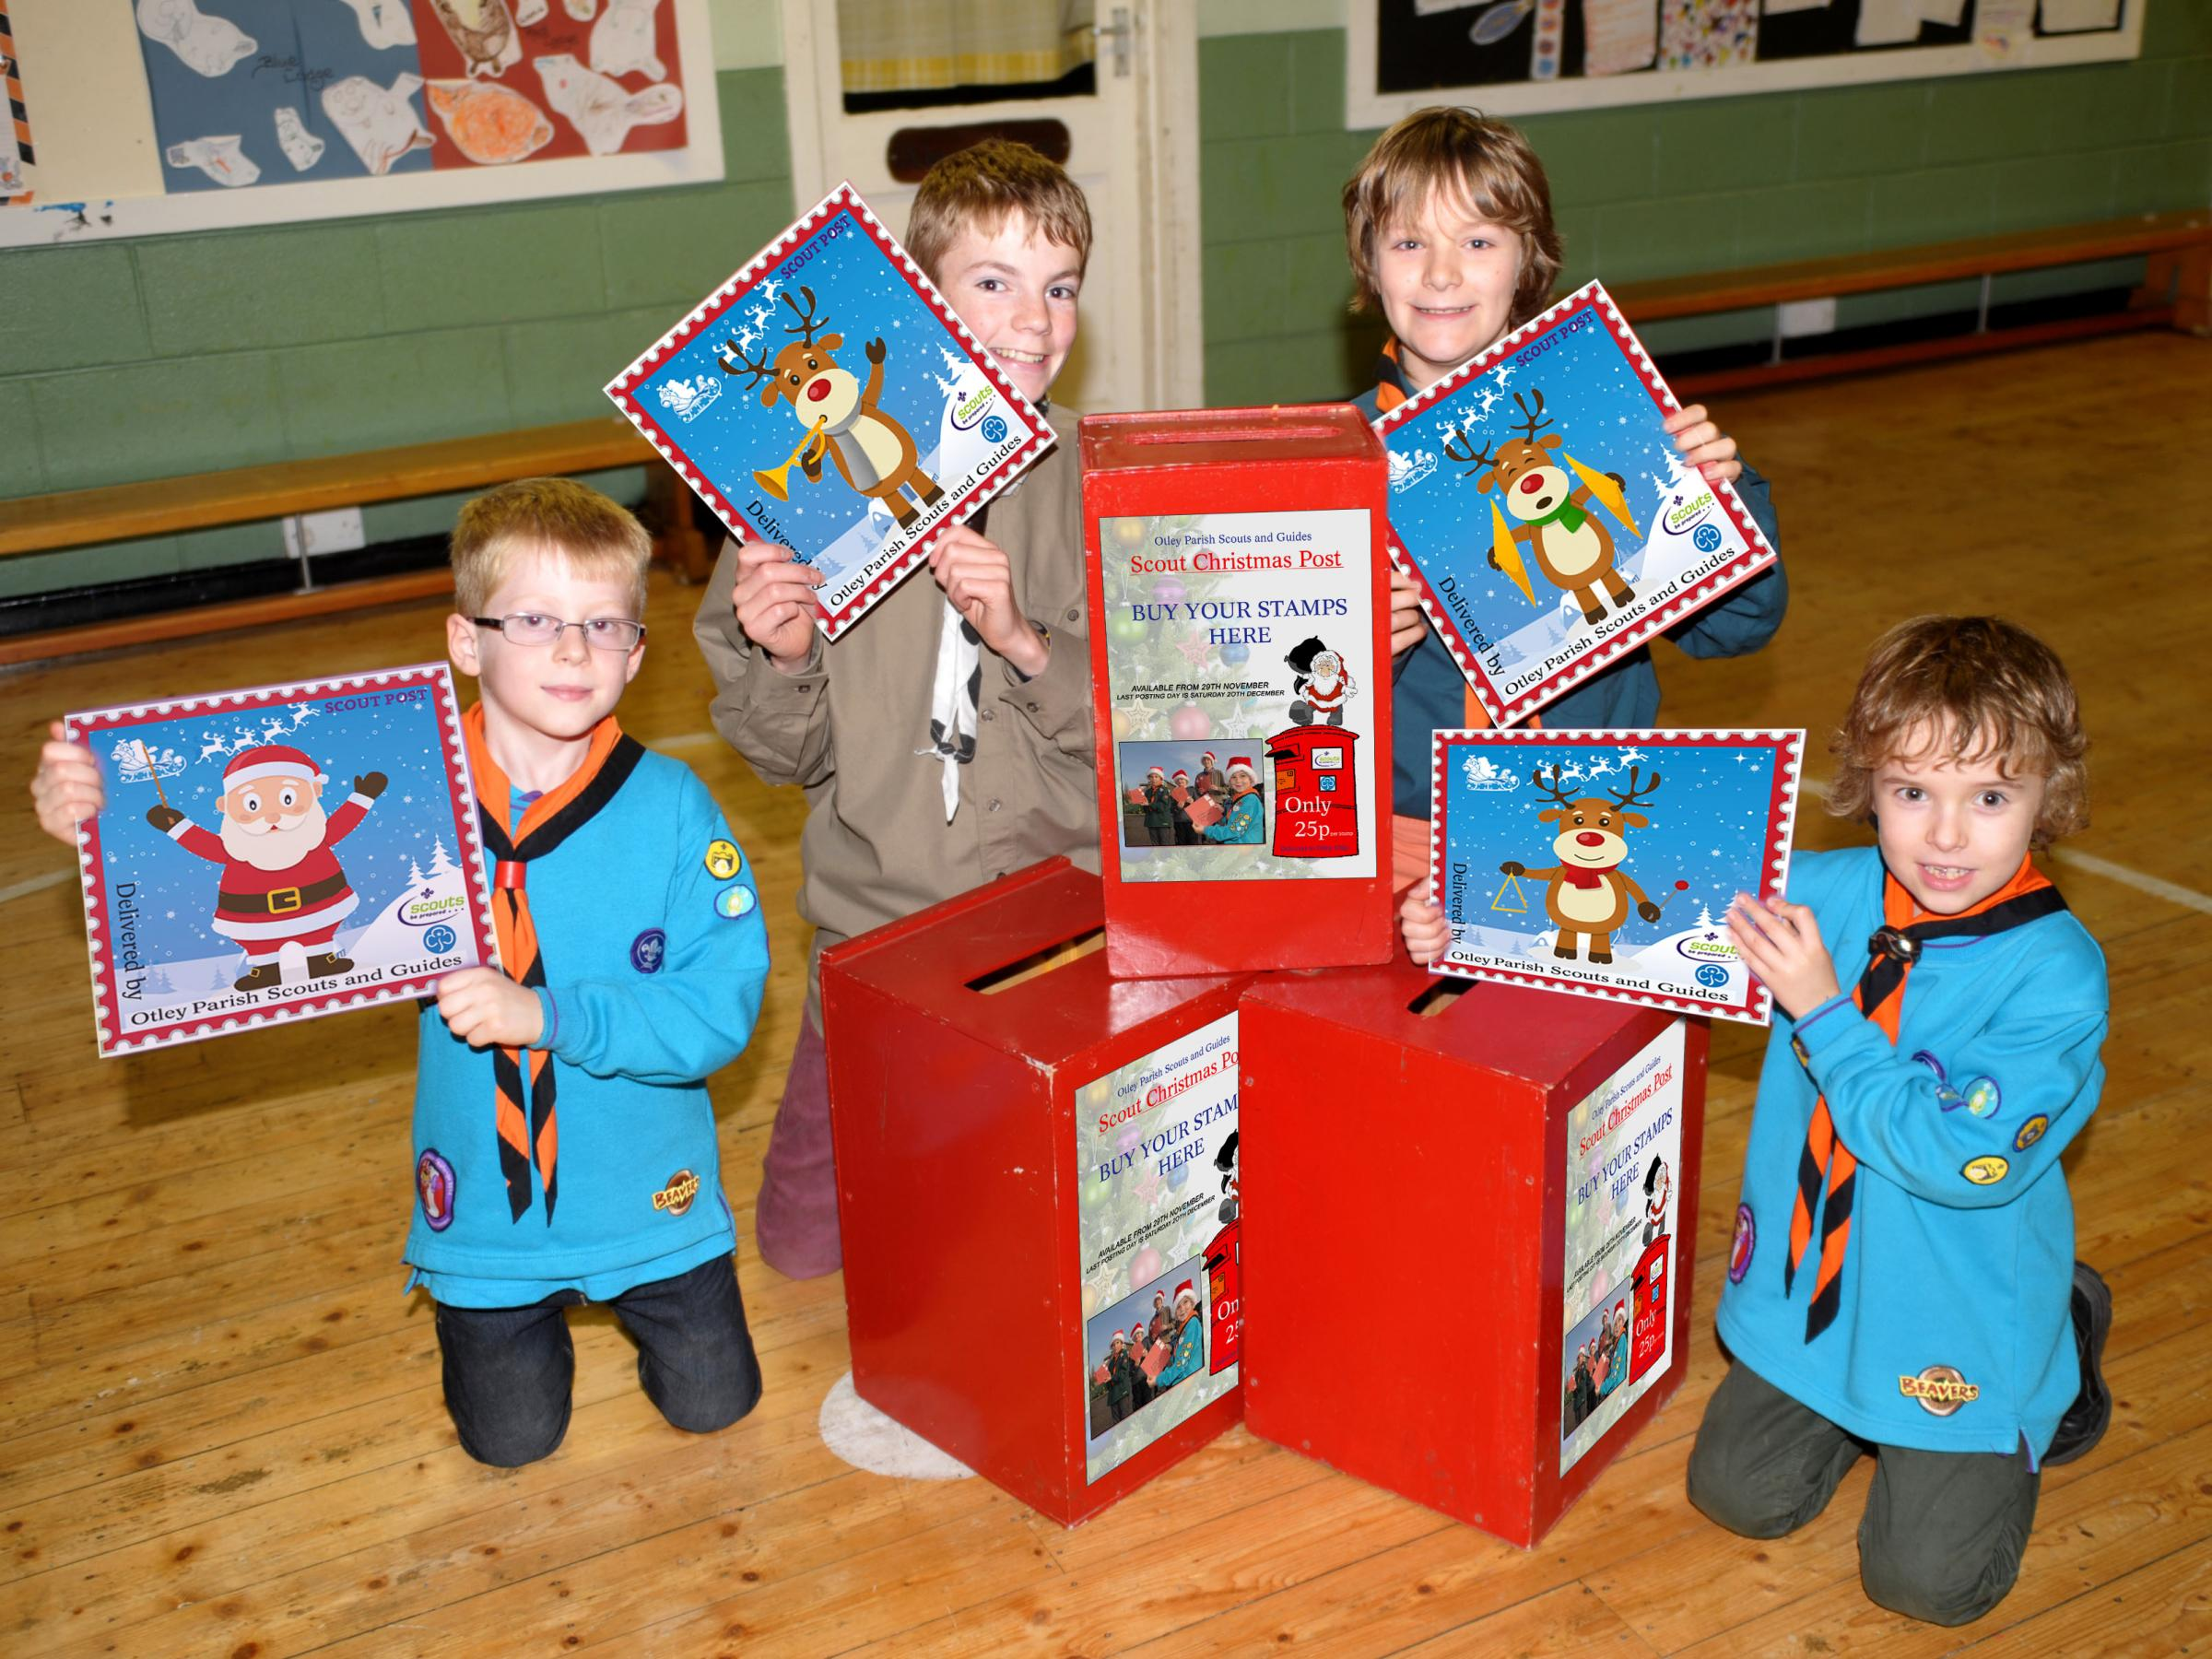 Otley Parish Beavers Scouts